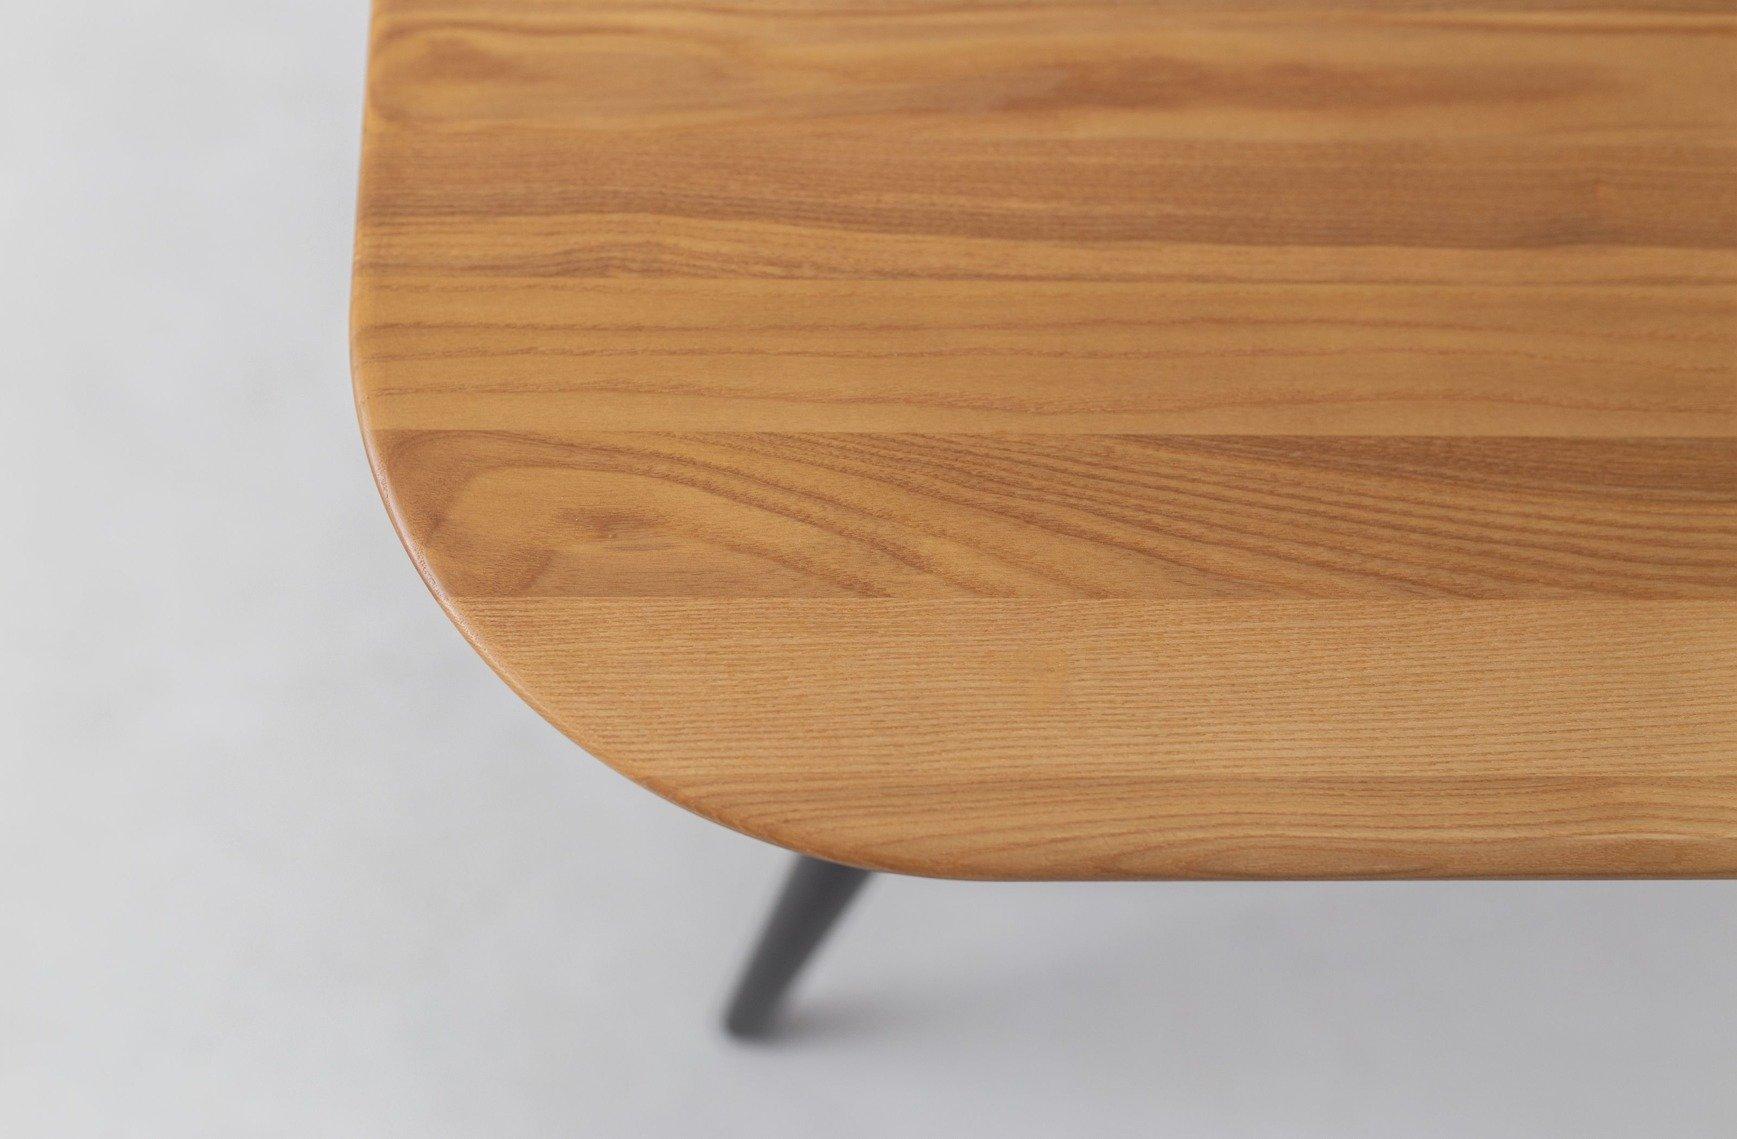 CONTRAST Dining Table 9x9x9cm   Oak / Black Legs